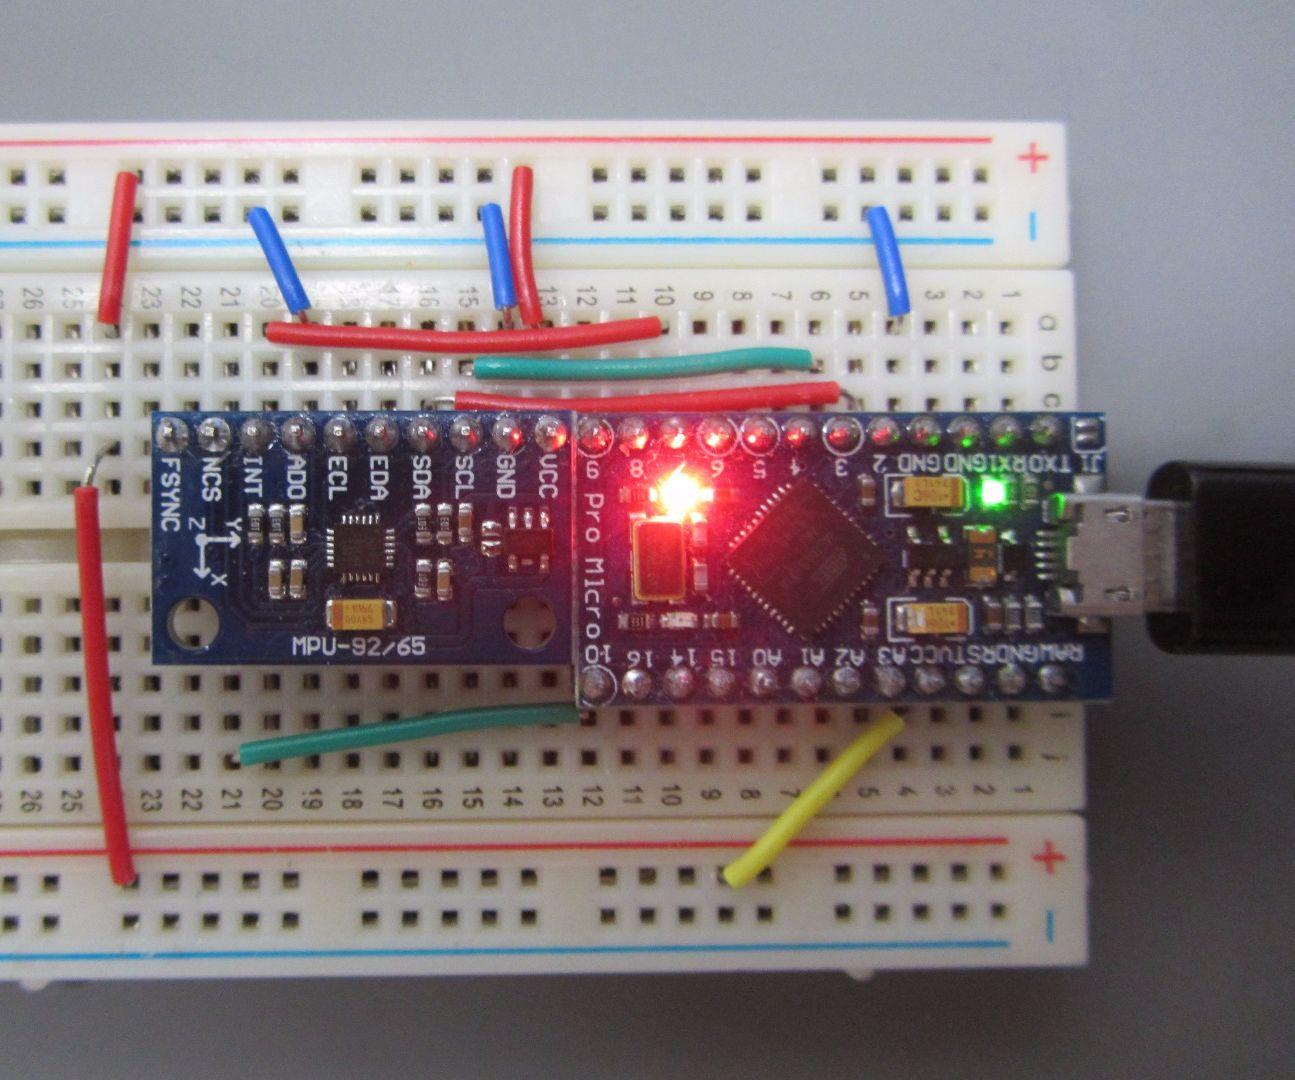 MPU-9150/9250 IMU With Arduino Pro-Micro: 4 Steps